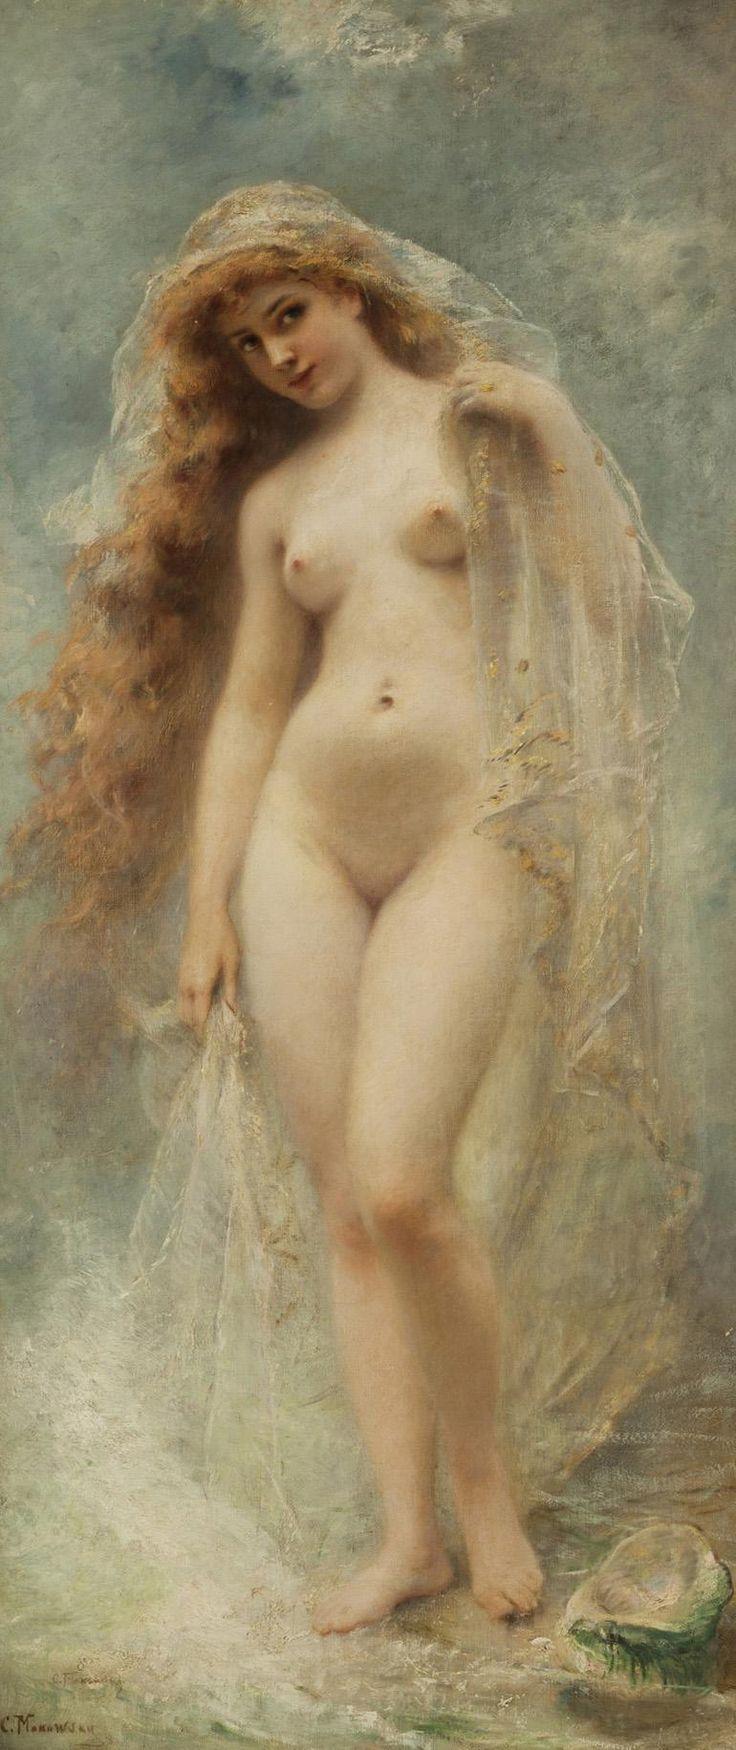 Konstantin Makovsky (1839-1915) - Birth of Venus